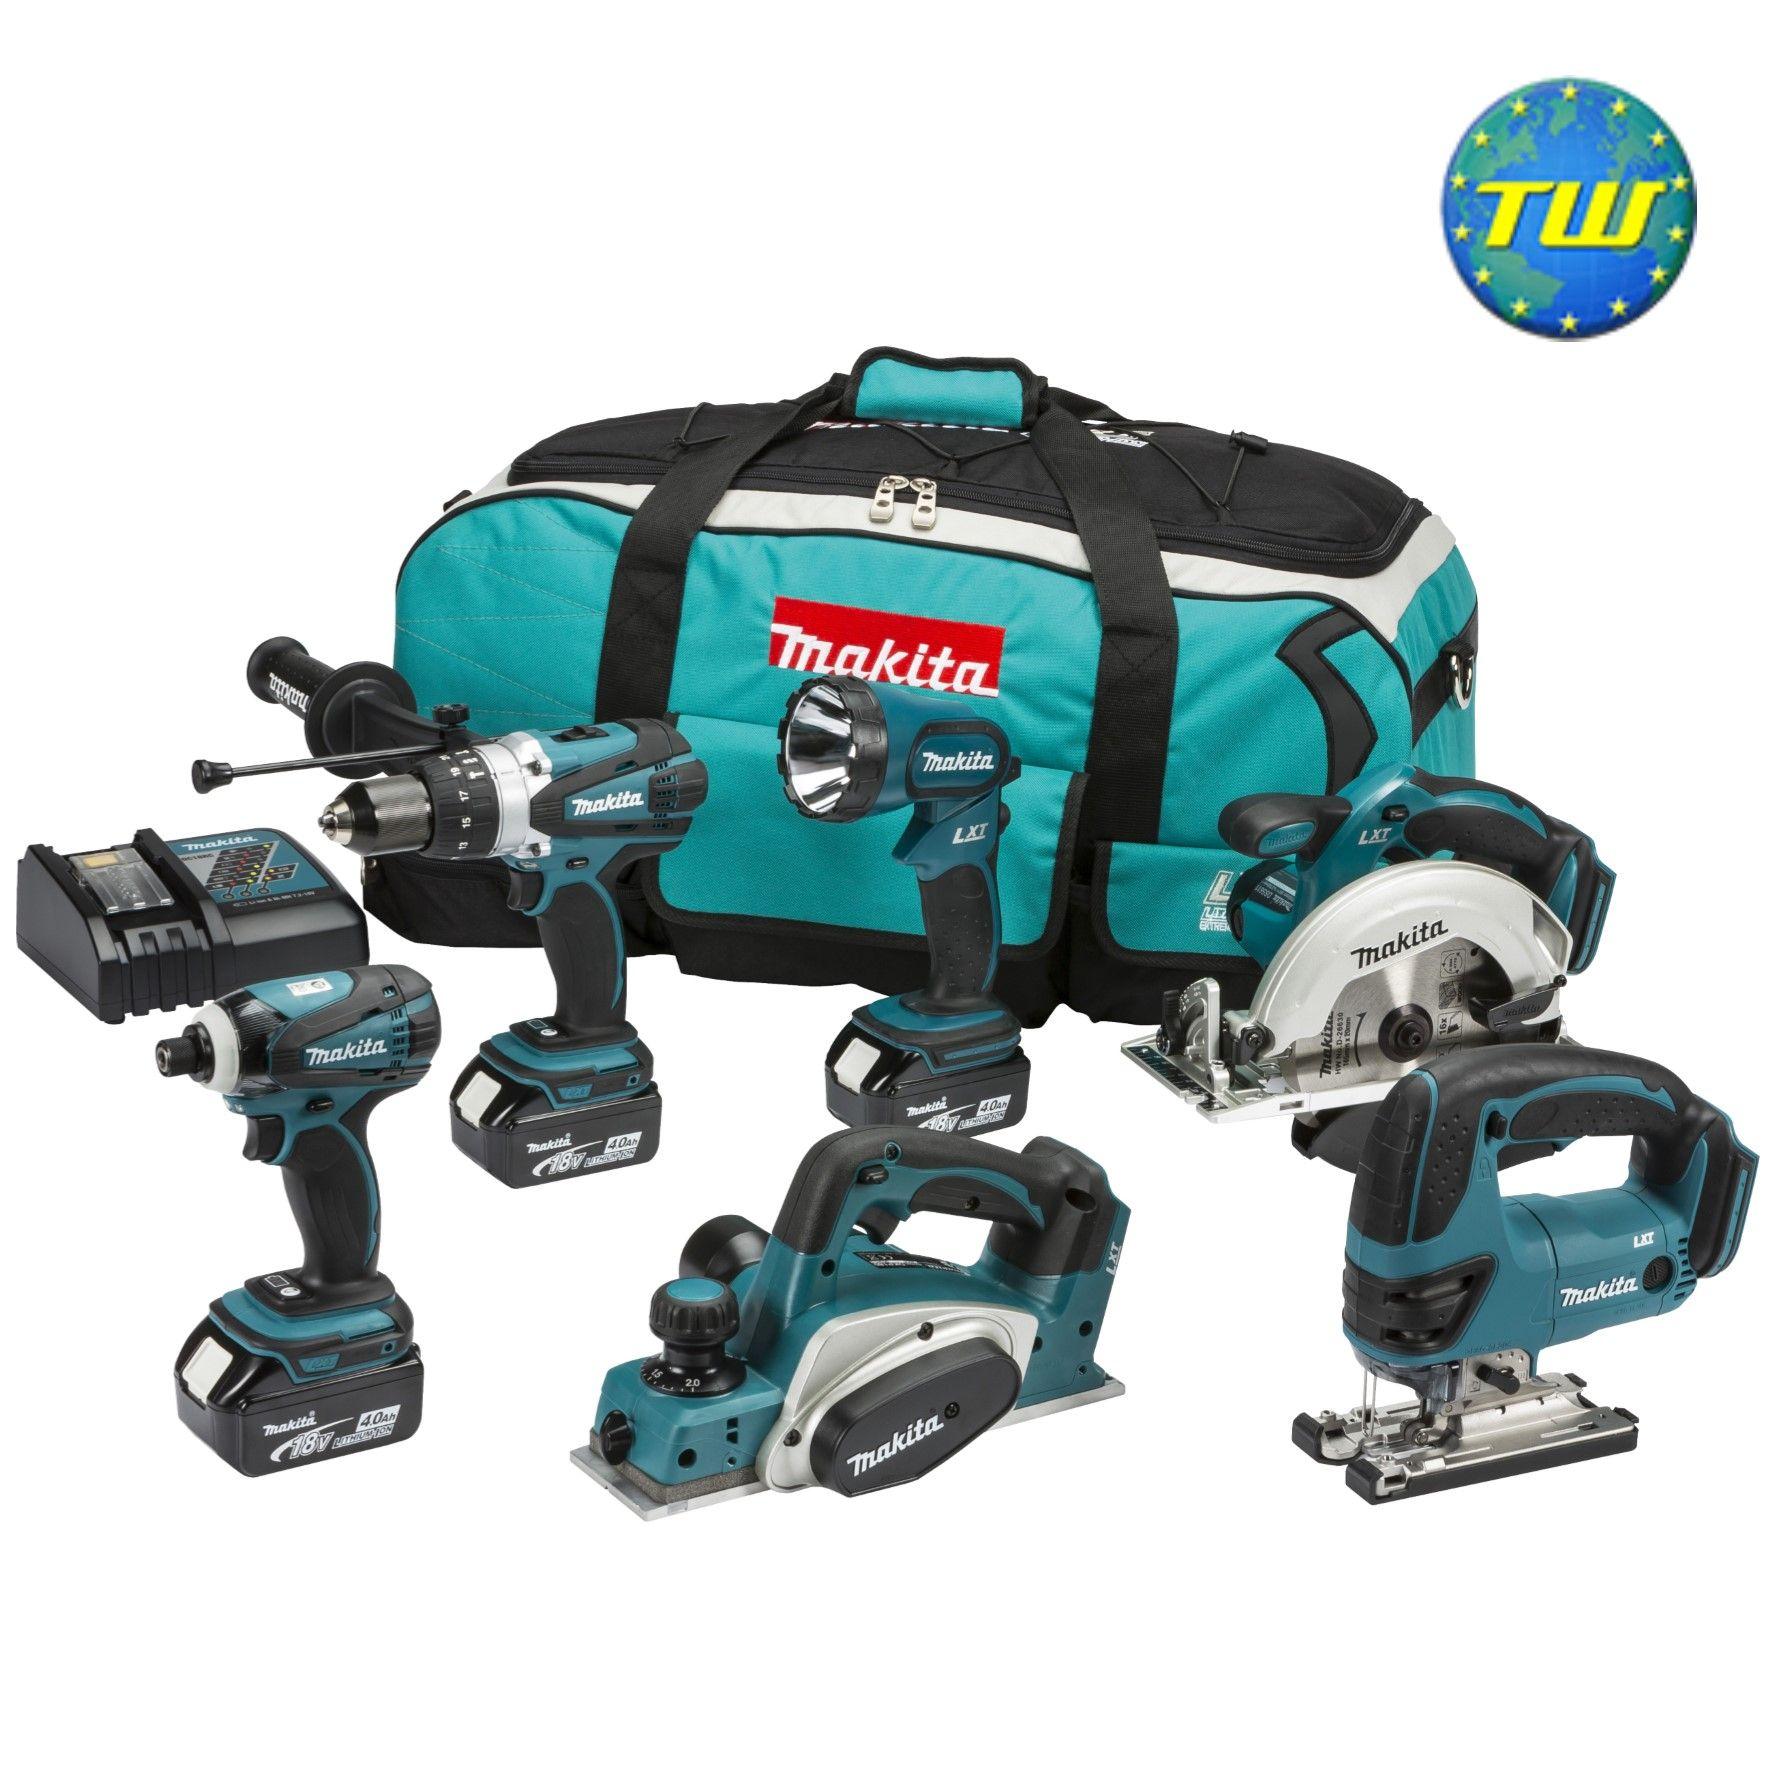 Pin Av Tw Wholesale Pa Makita Power Tools Tools Power Tools Og